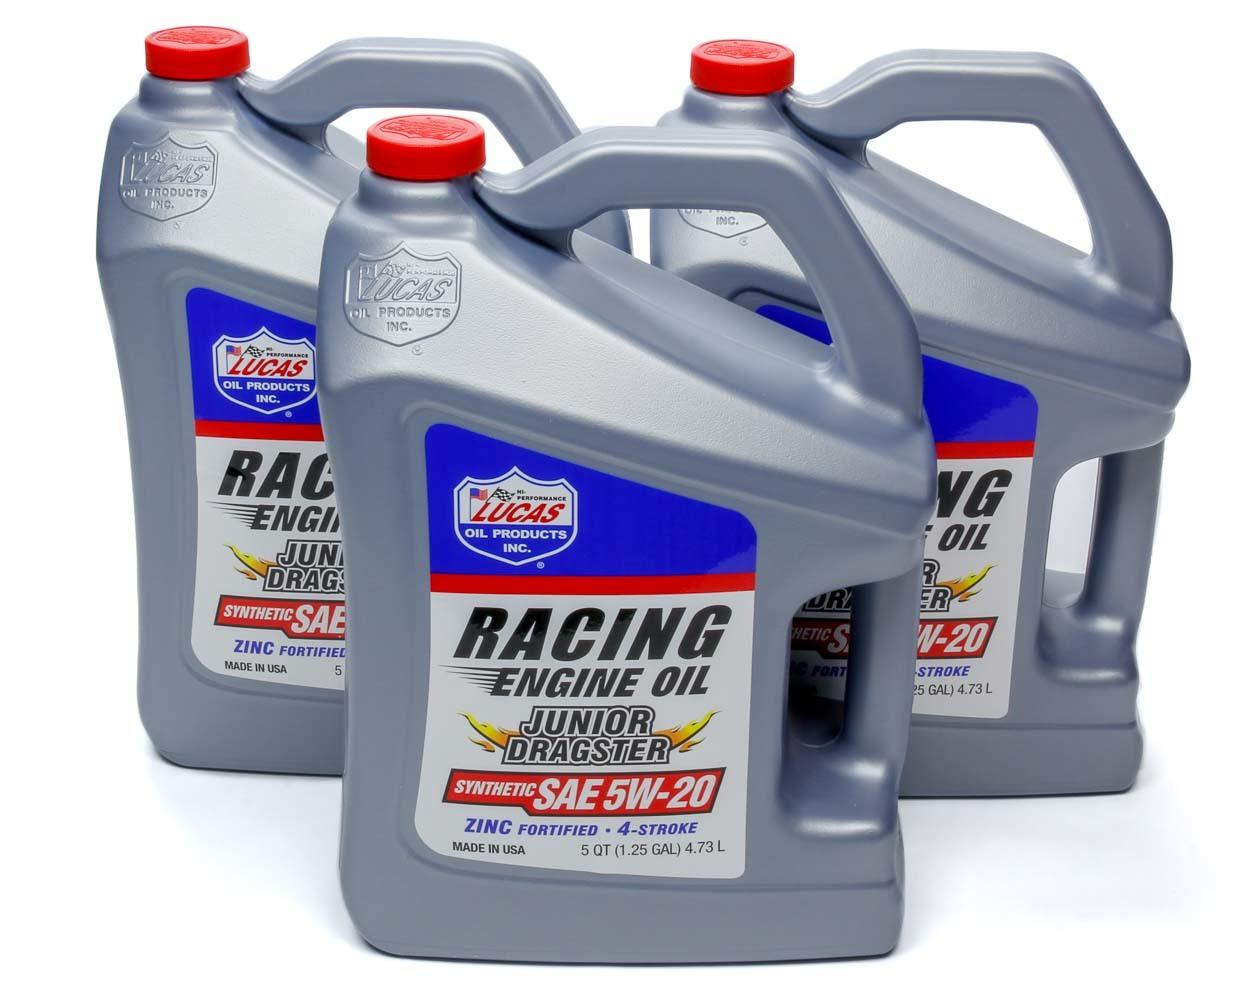 Jr. Dragster-Karting Oil 5w20 Case 3 x 5 Qt Jug